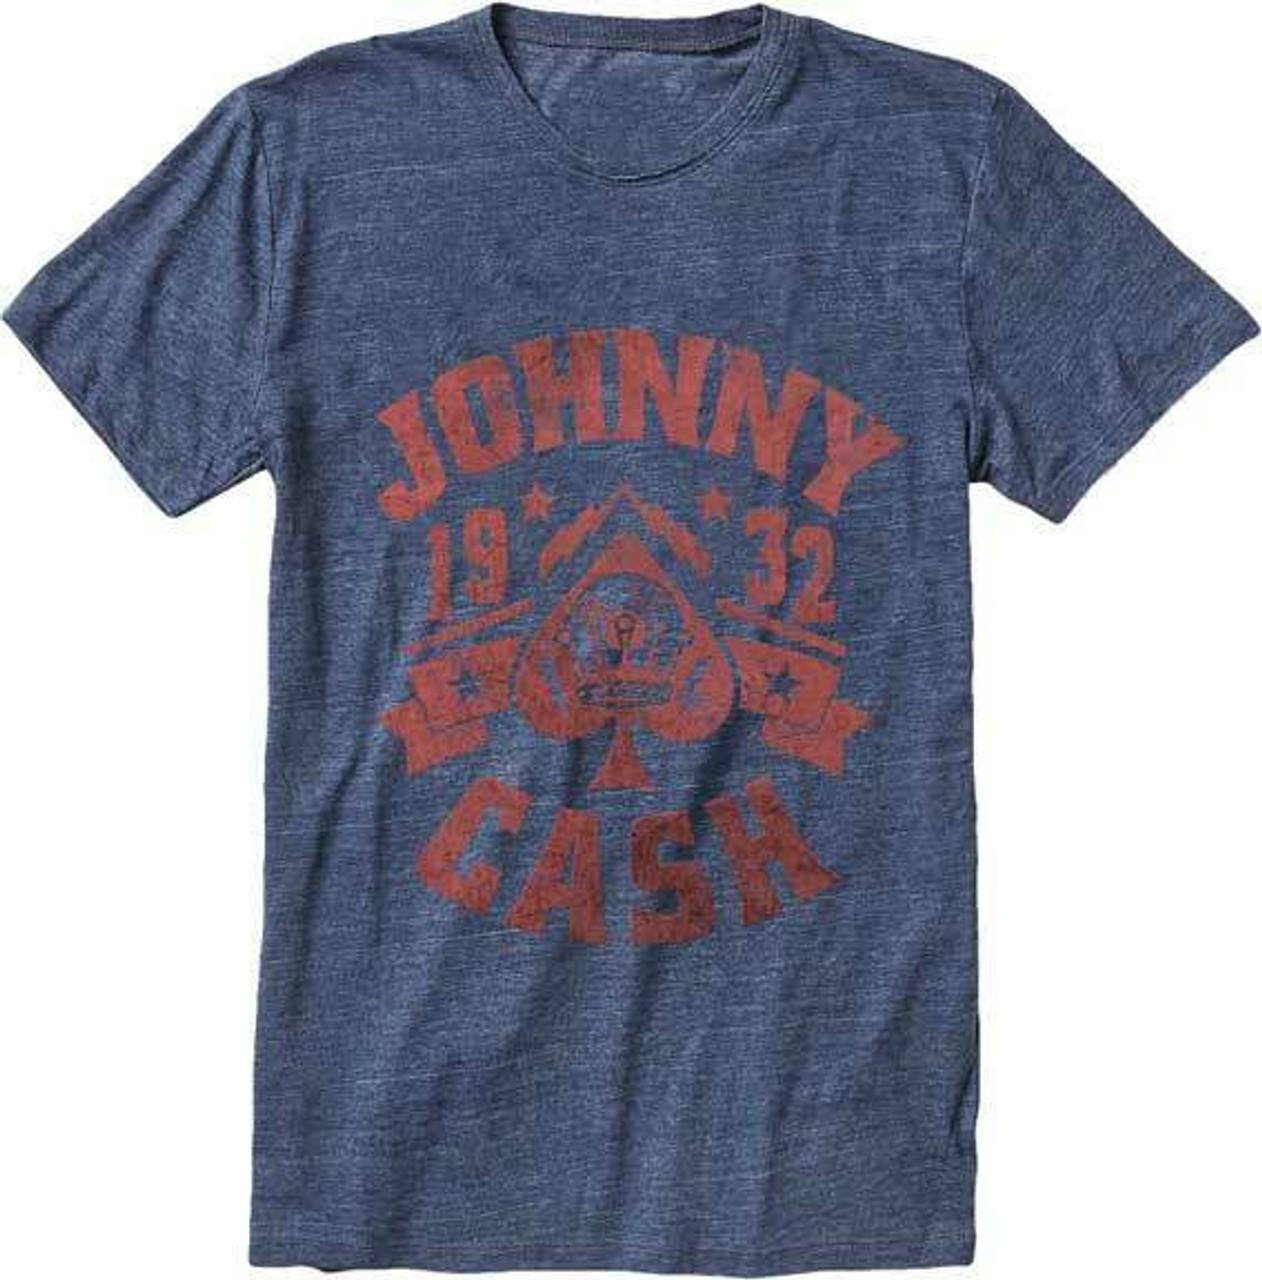 Johnny Cash Walk Crawl The Line Music Infant Romper One Piece Bodysuit 30030041